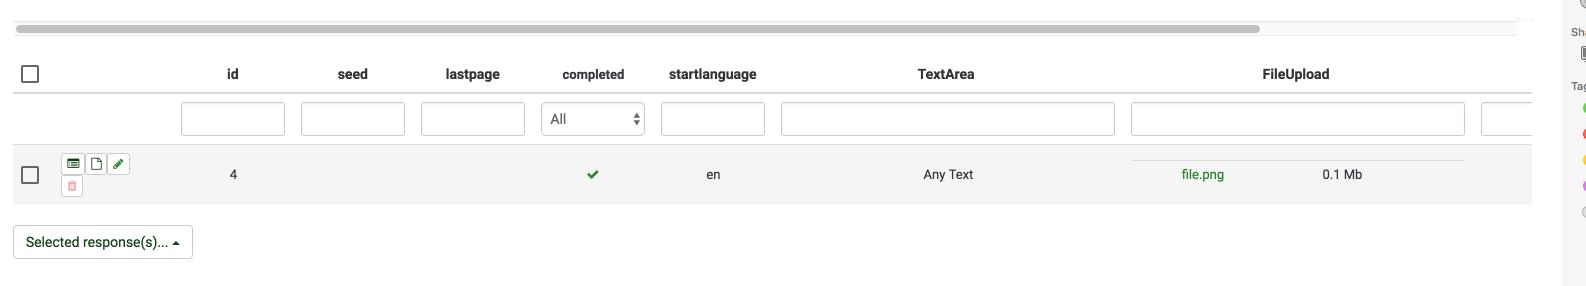 13794: RPC add_response reports error, still inserts a